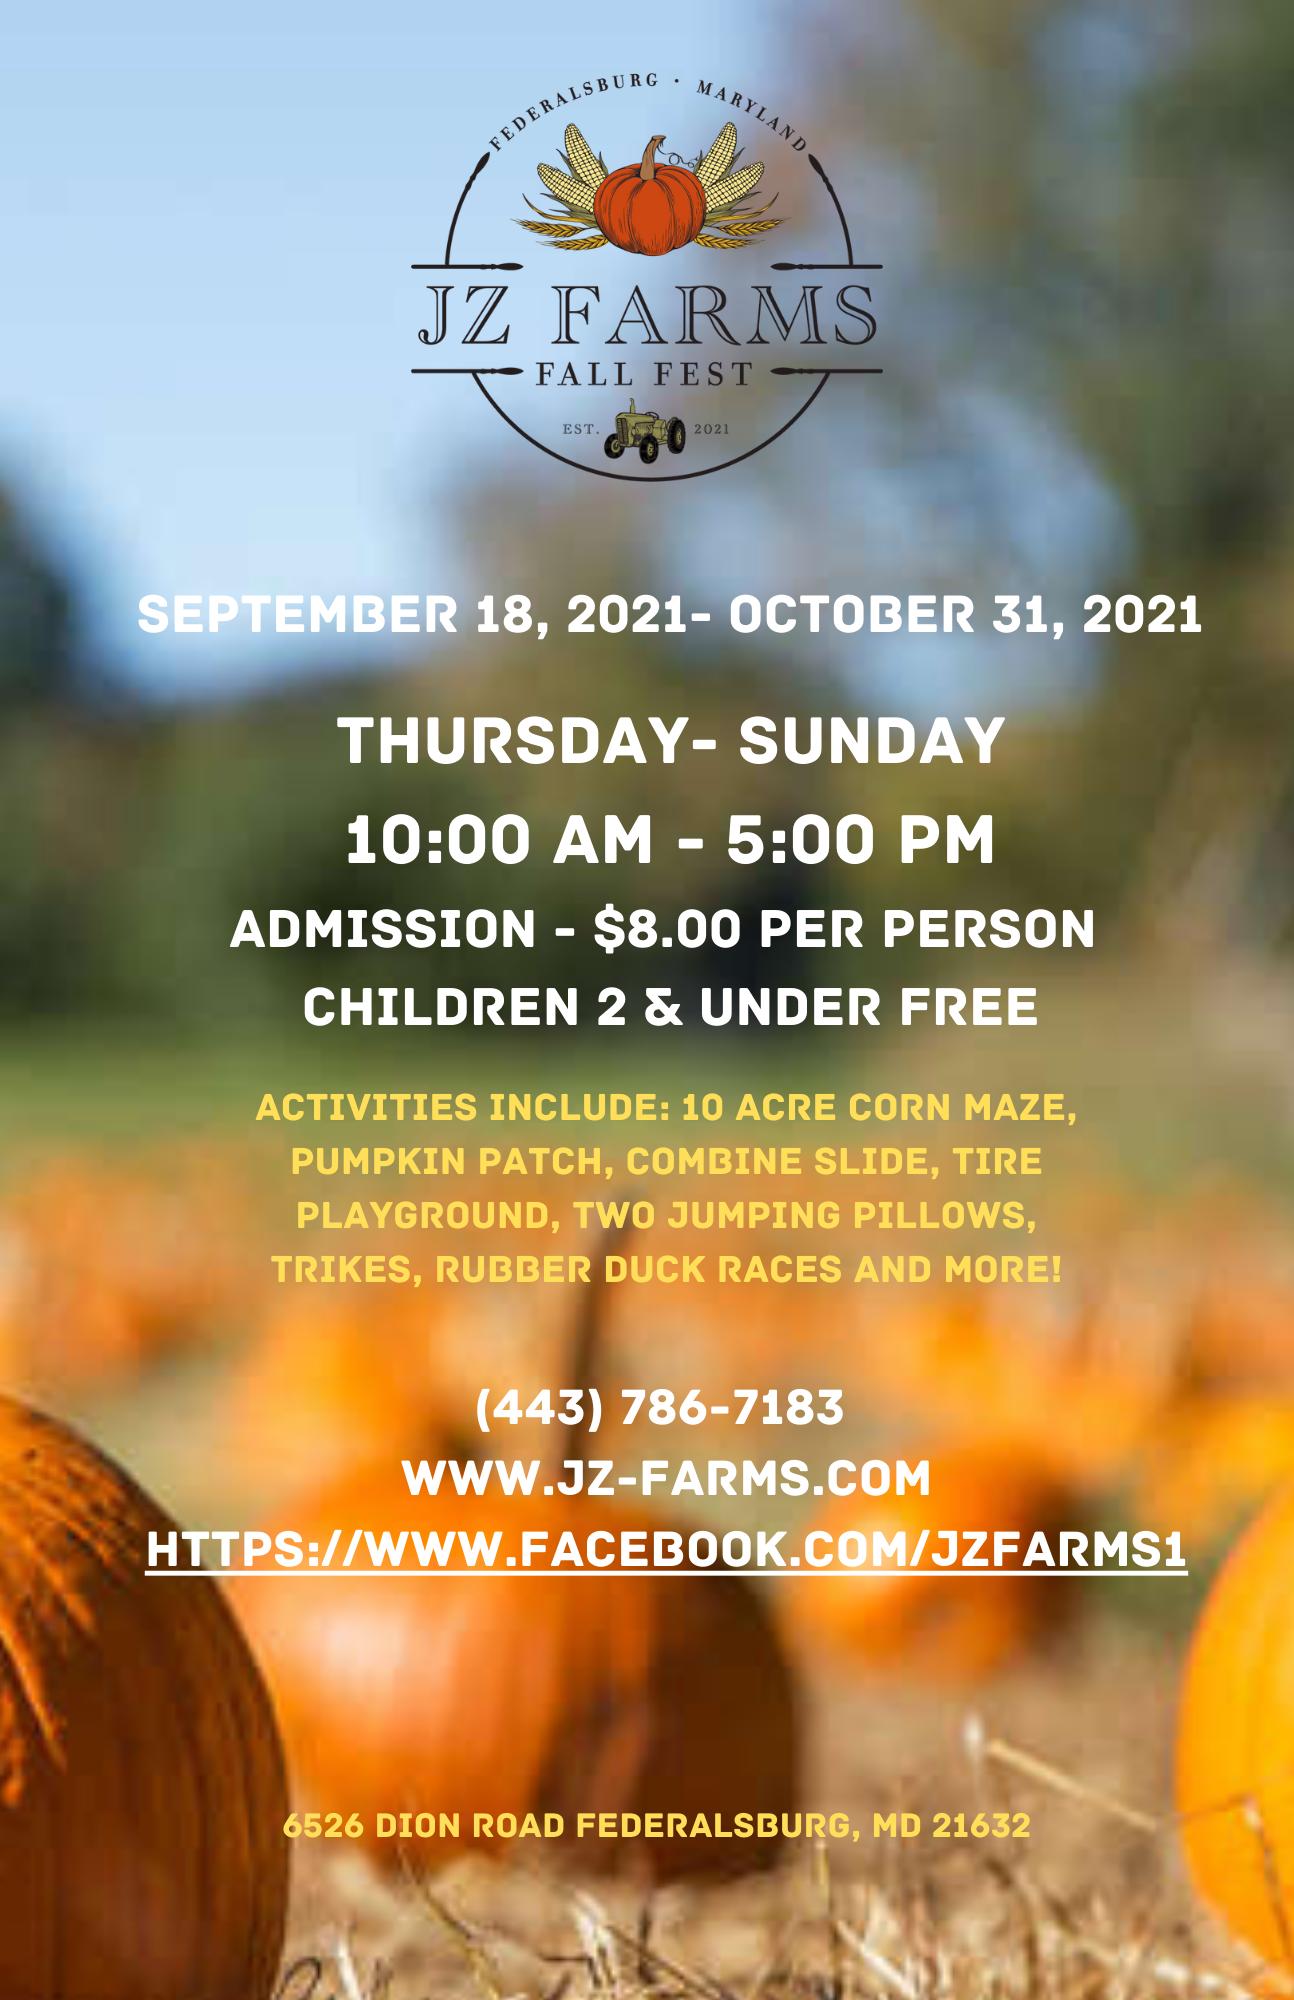 JZ-Farms-fall-festival-flyer-2.png